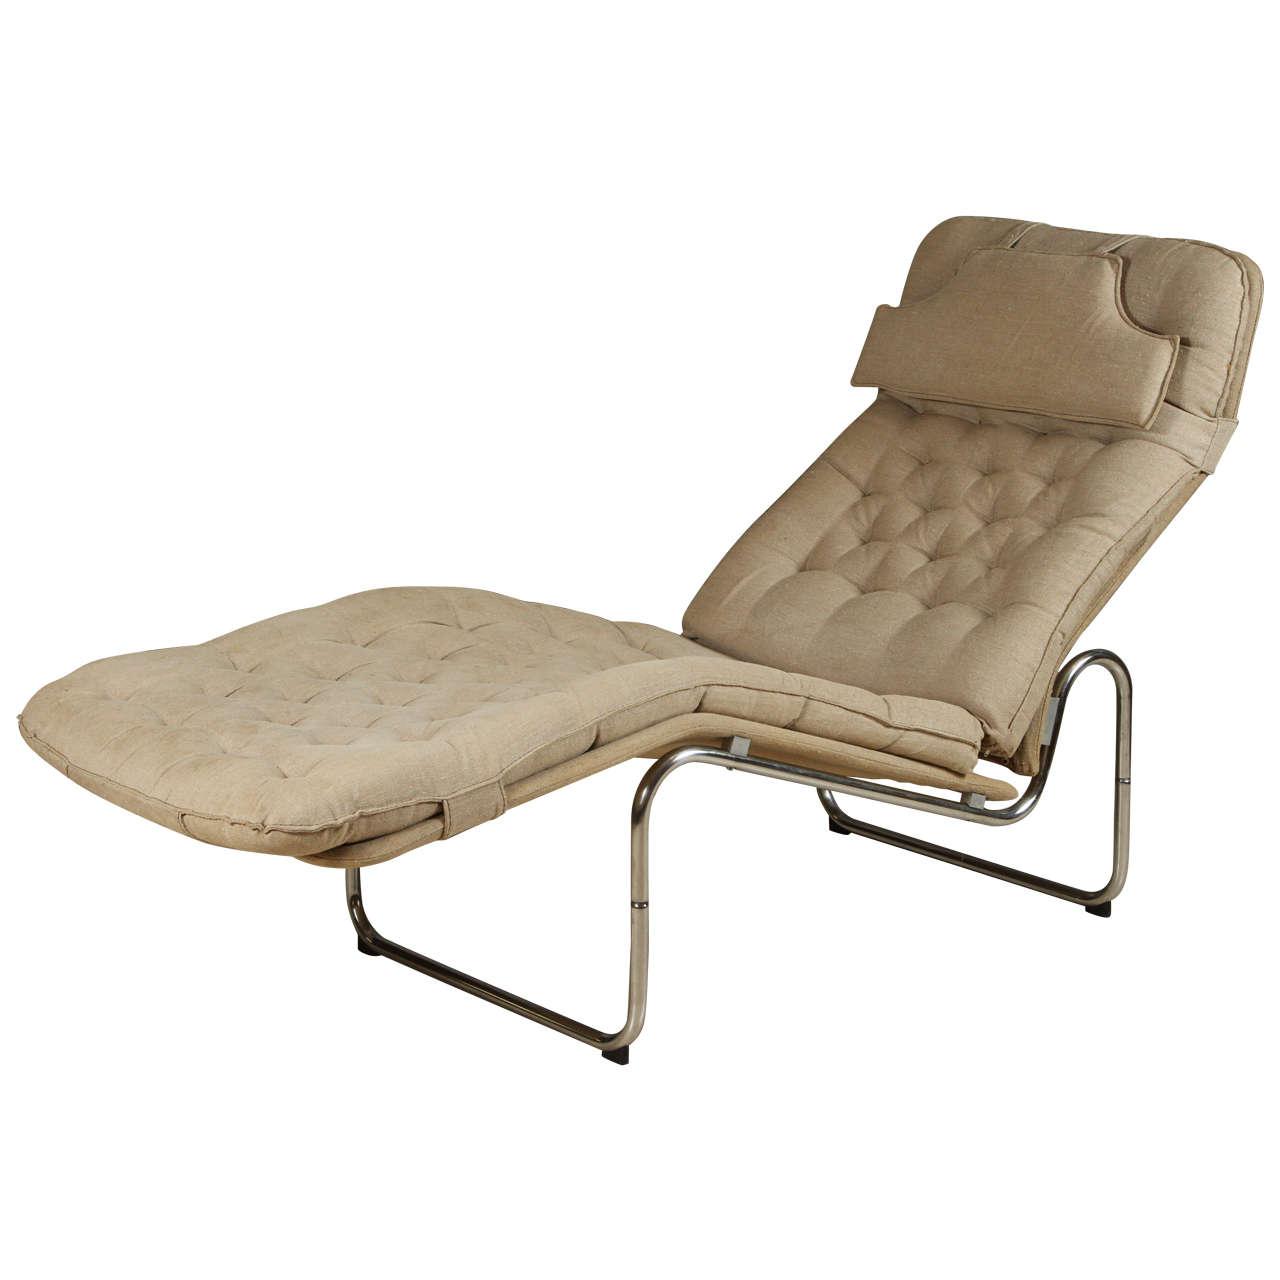 Bernard Chaise Lounge Of Tufted Scandinavian Chaise Lounge In Original Belgian